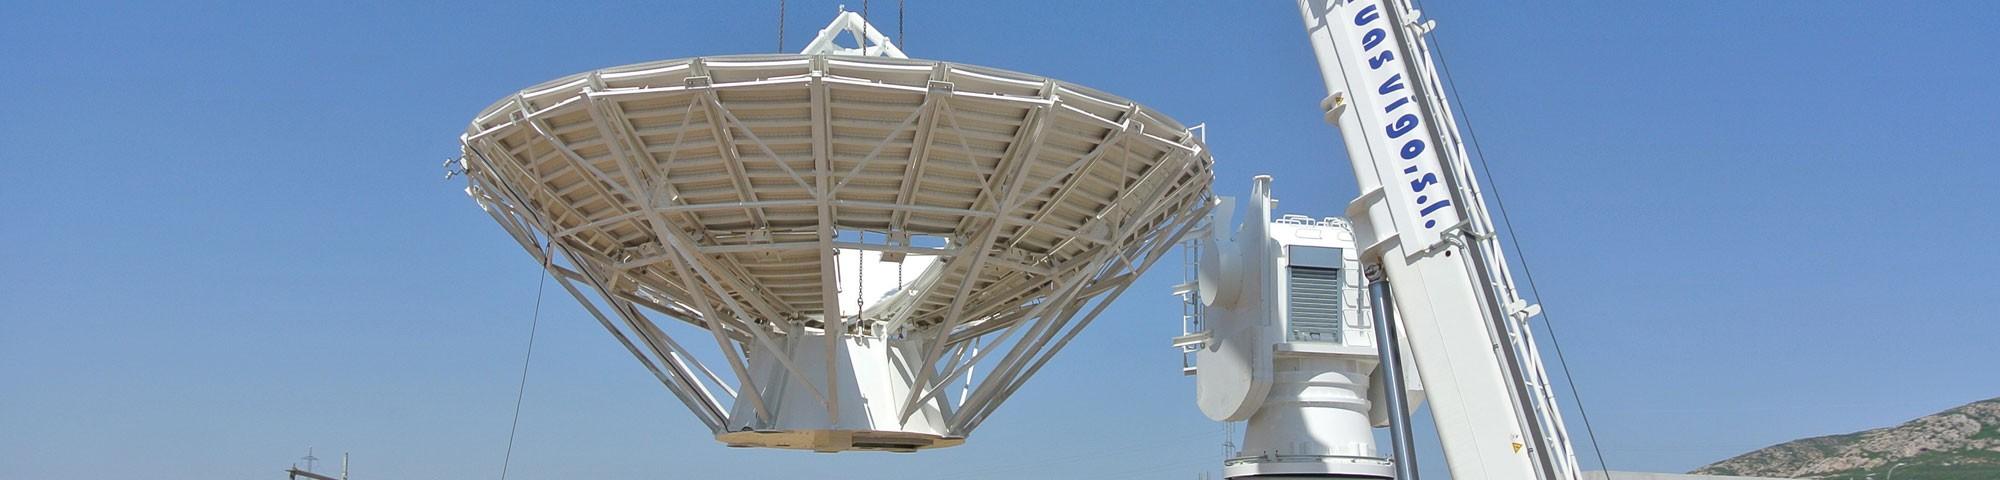 slider-img-section-negocios-elecnor-infraestructuras-telecomunicaciones